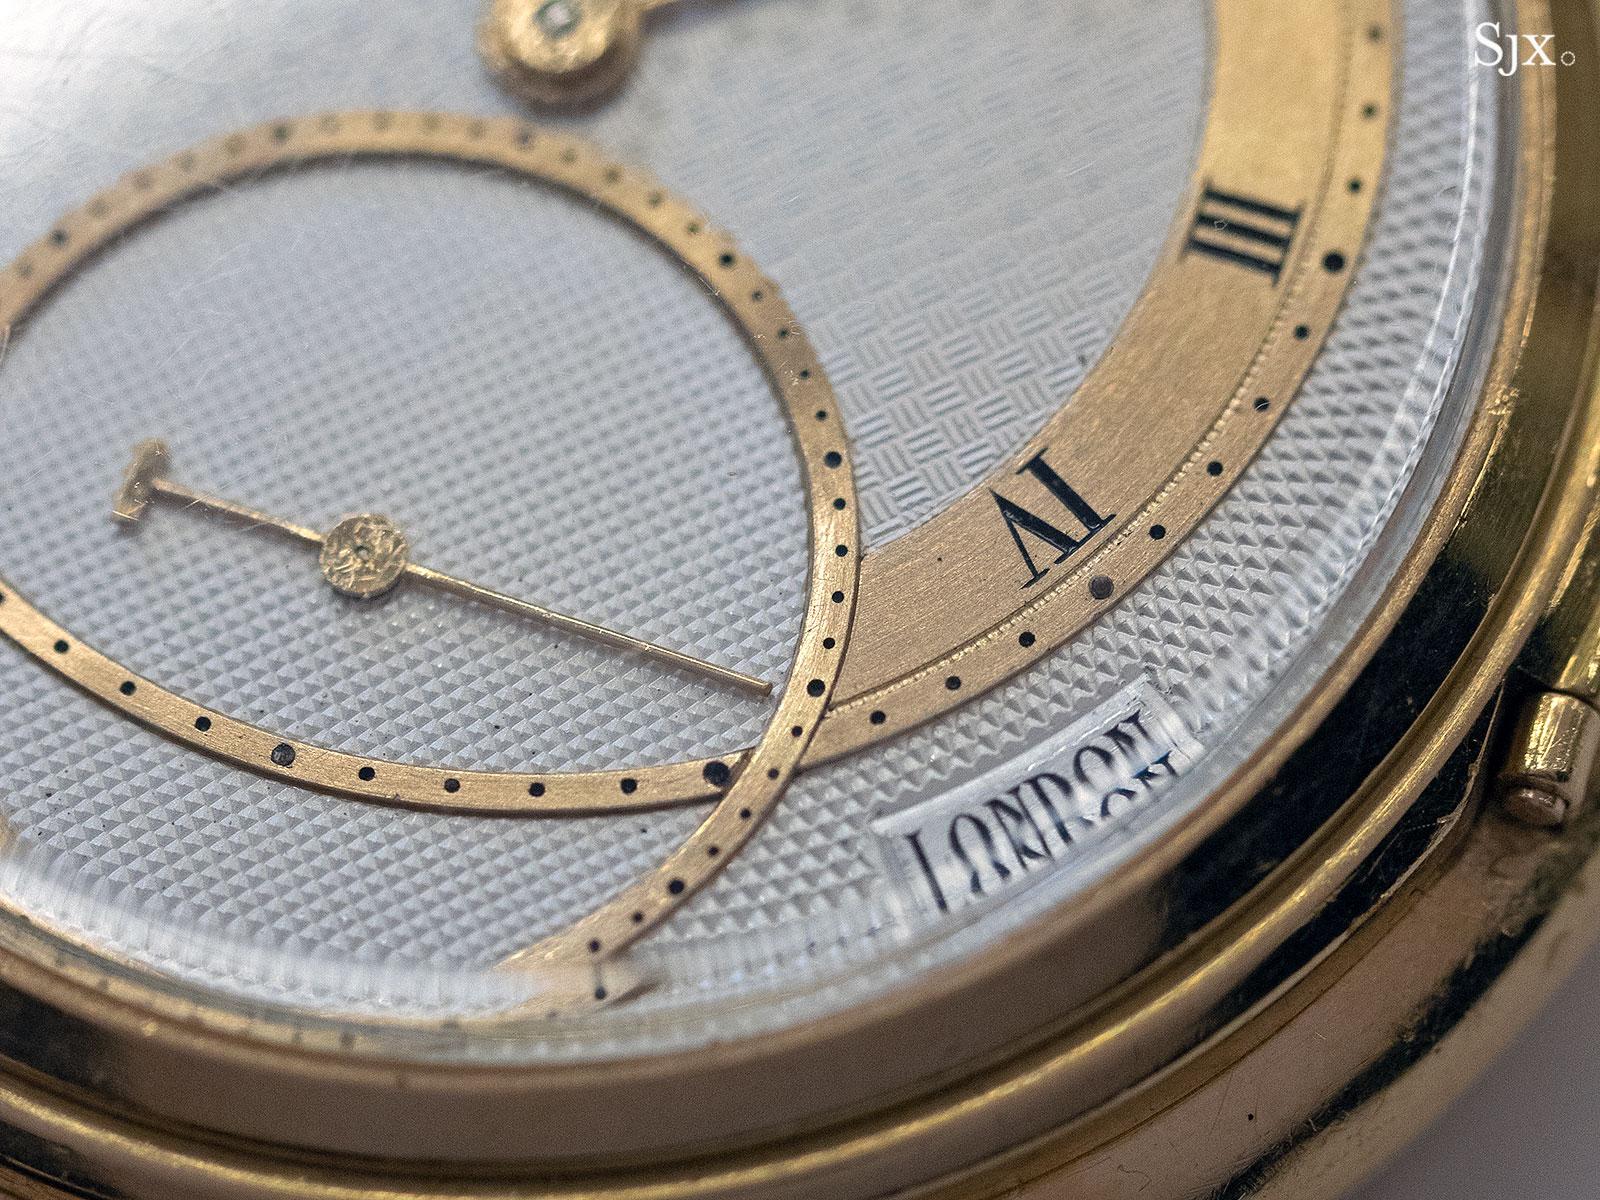 George Daniels Spring Case Tourbillon Wristwatch 4